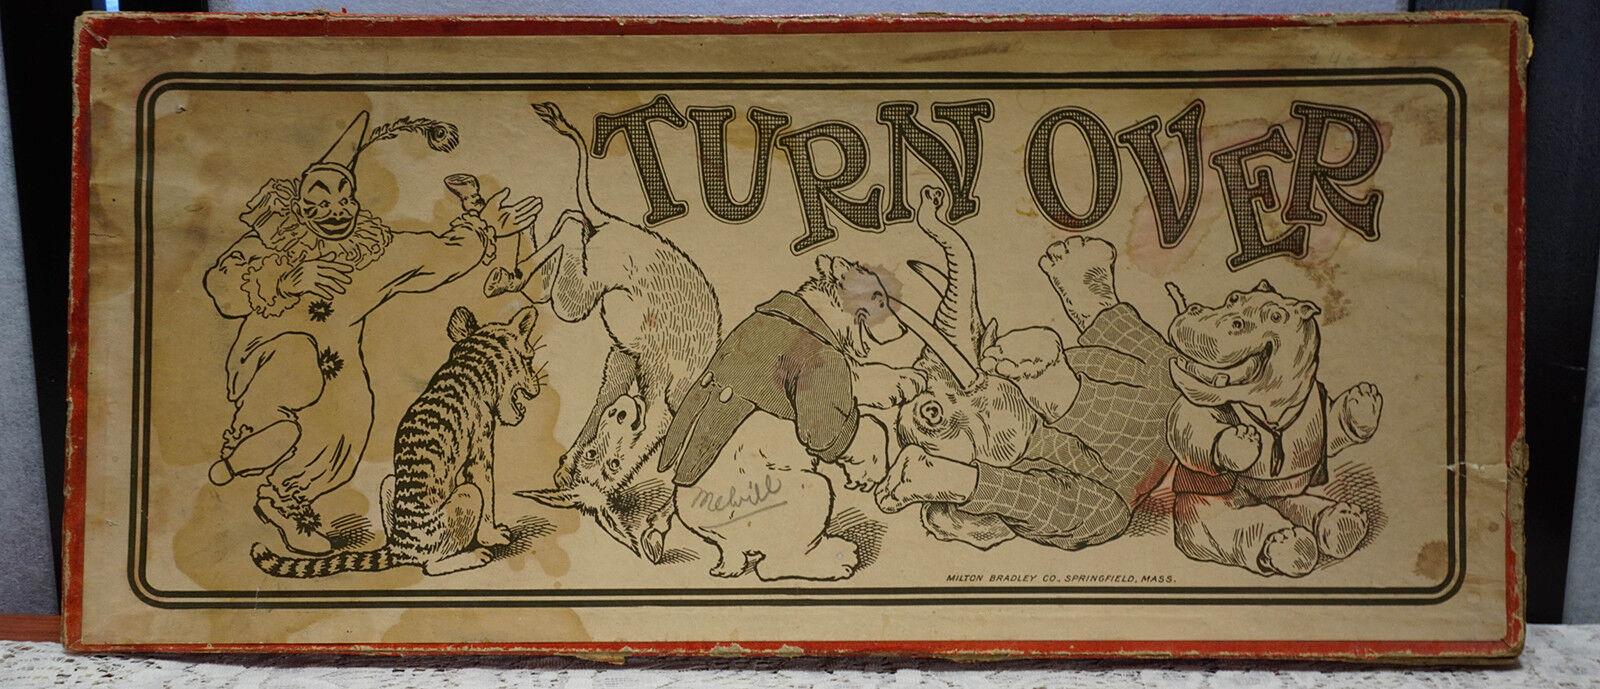 1908 TURN OVER Jumping Bean Foxy Grandpa Katzenjammer Captain and the Kids